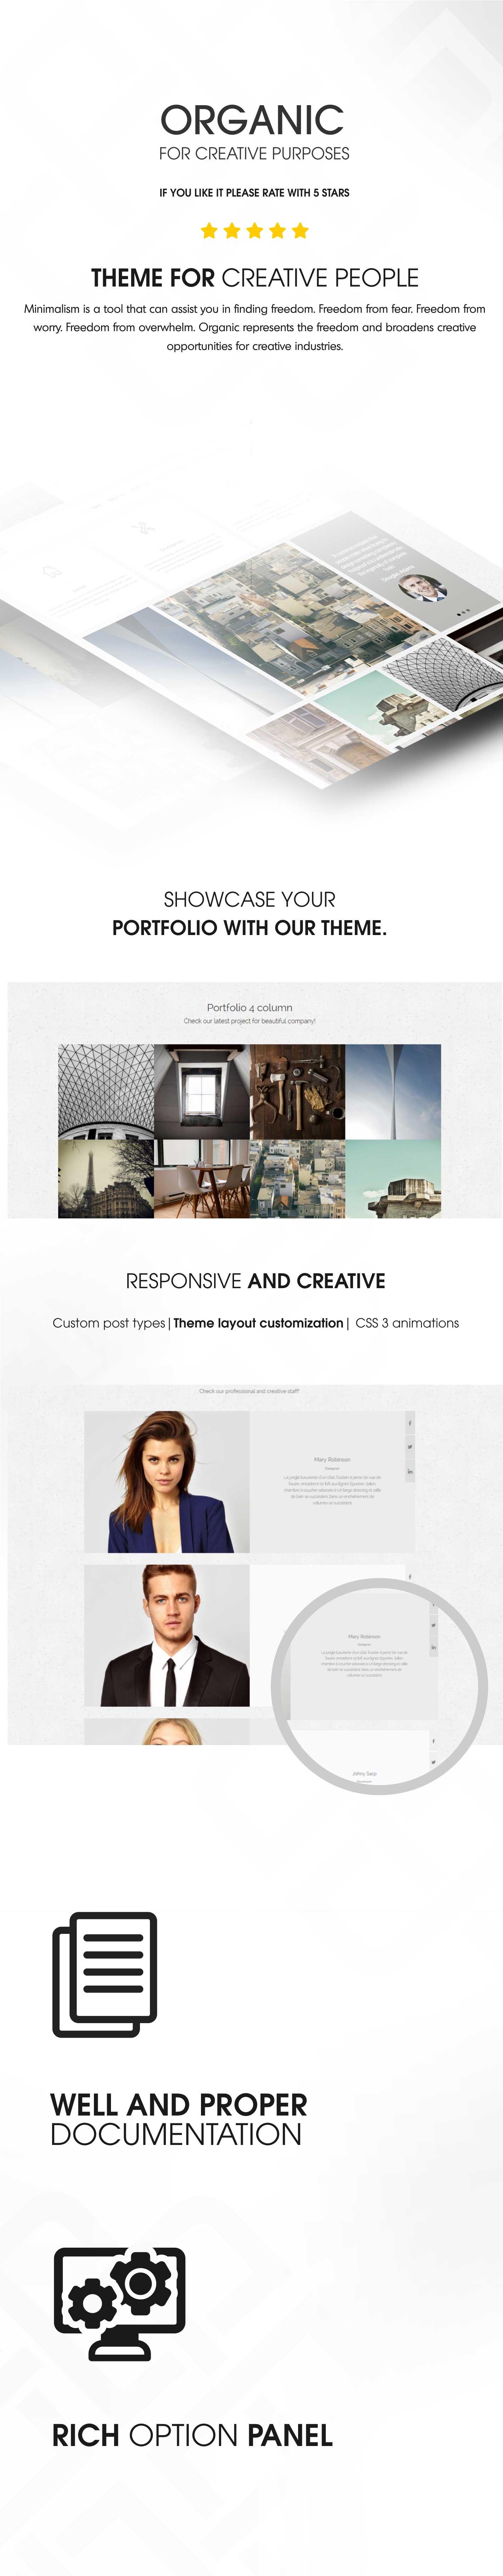 Wordpress Kreativ Template Organic - Architecture & Creatives WordPress Theme